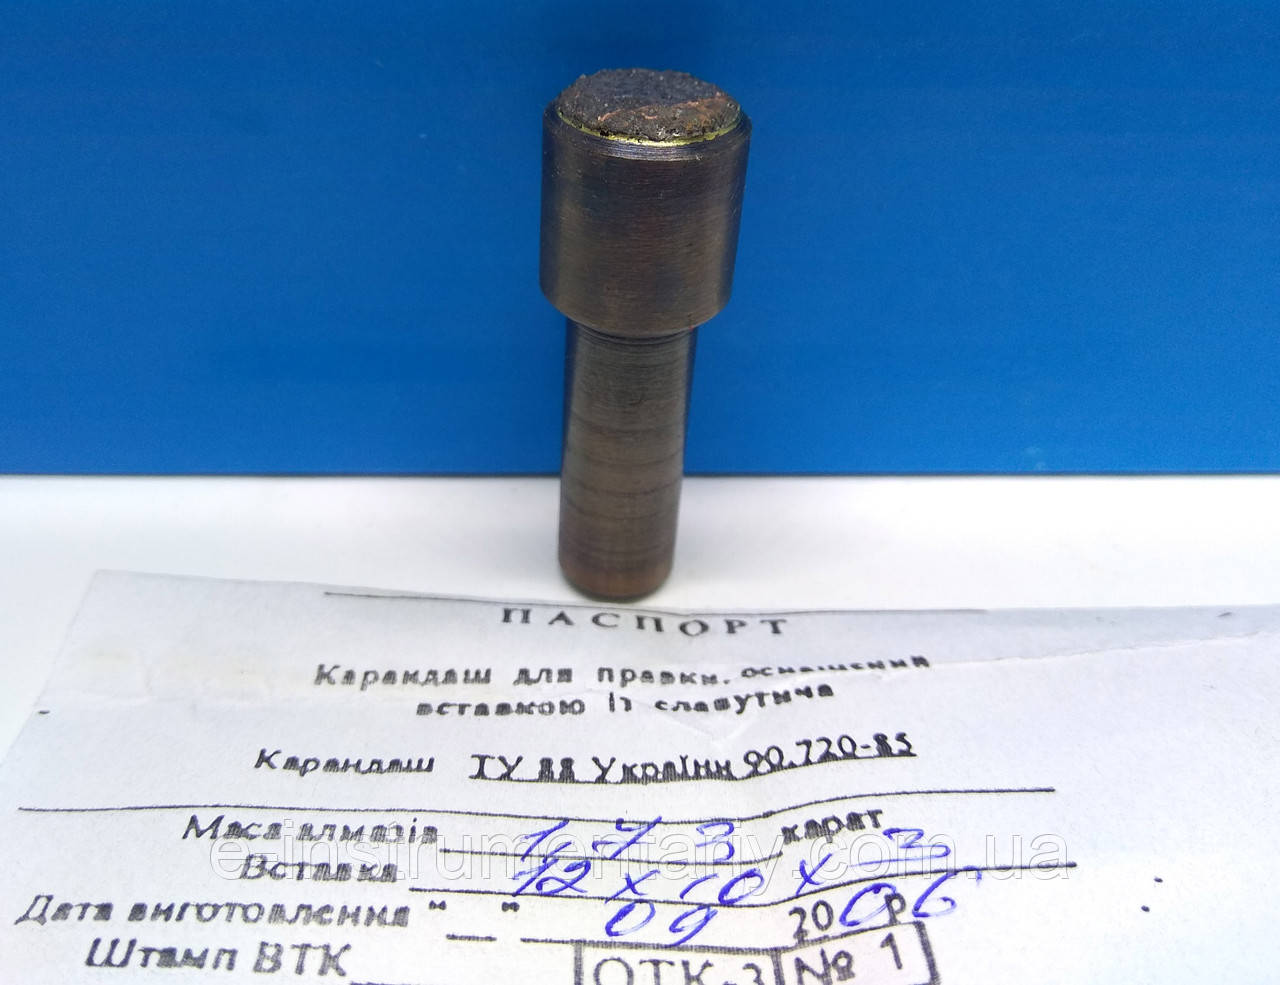 Карандаш алмазный Славутич тип 04 исп.С 1,73 карат.